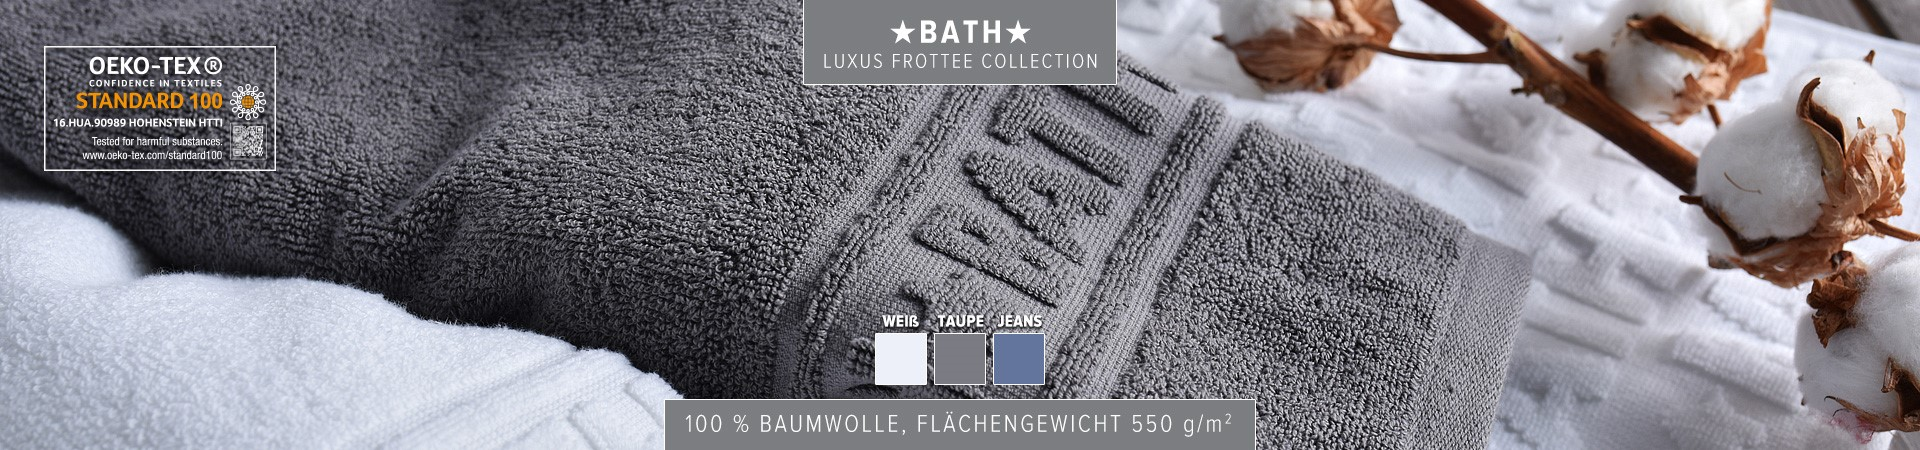 BATH Kollektion